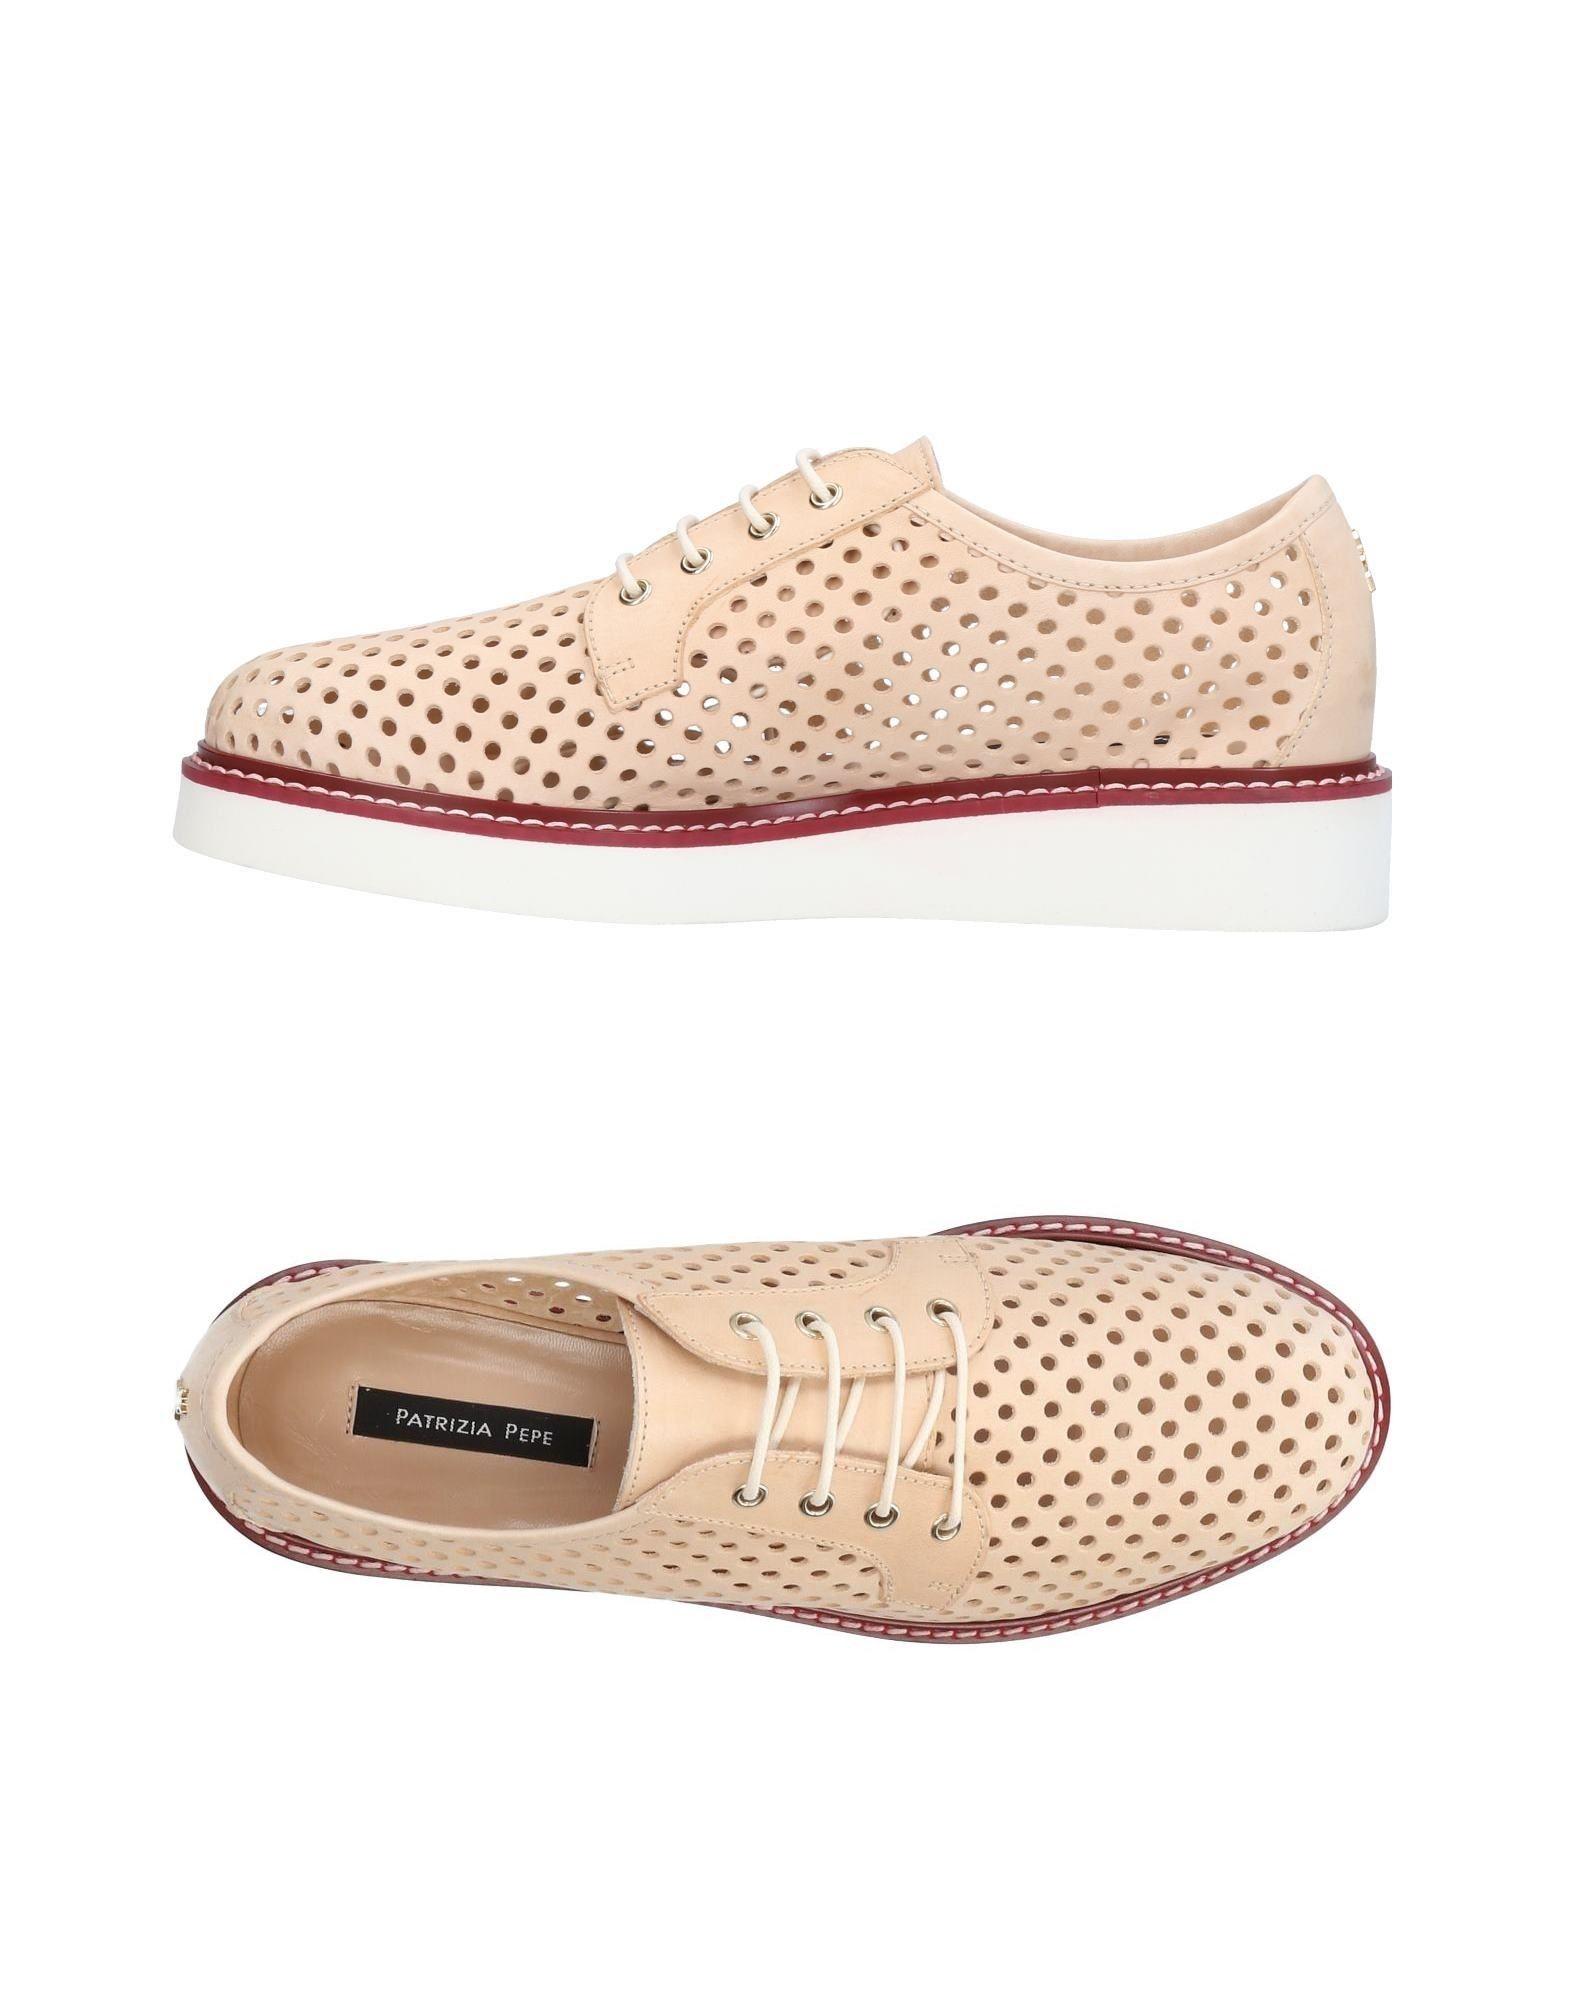 Patrizia Pepe Schnürschuhe Damen  11436154EB Gute Qualität beliebte Schuhe